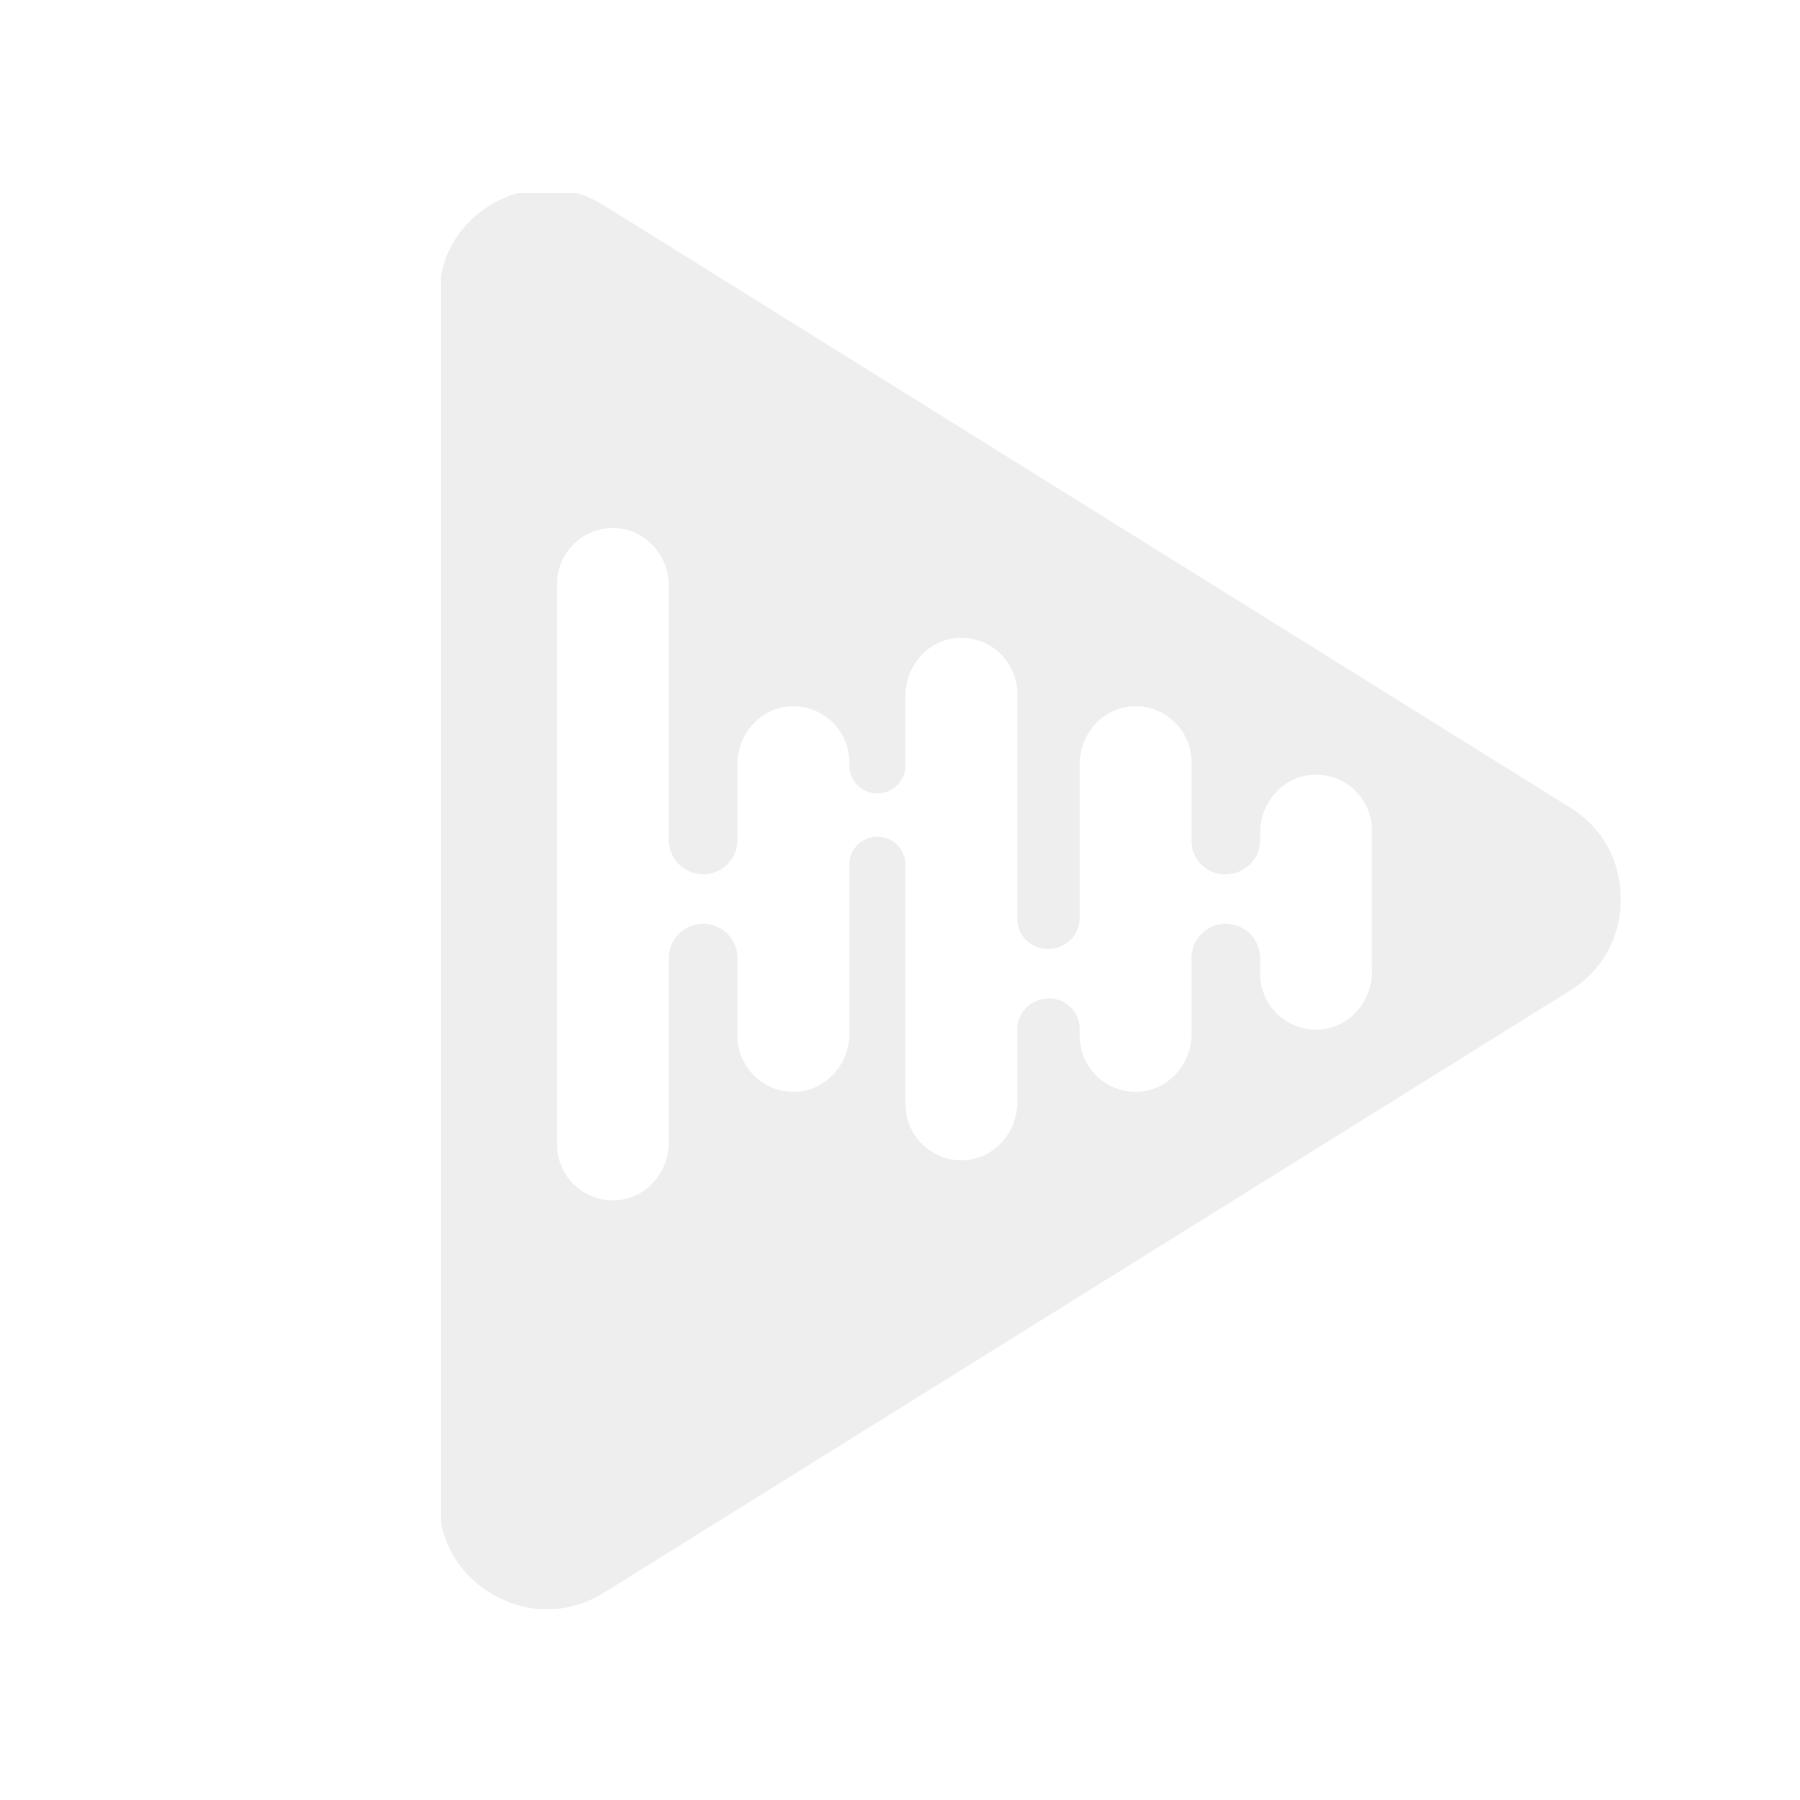 Speedsignal C-3414107